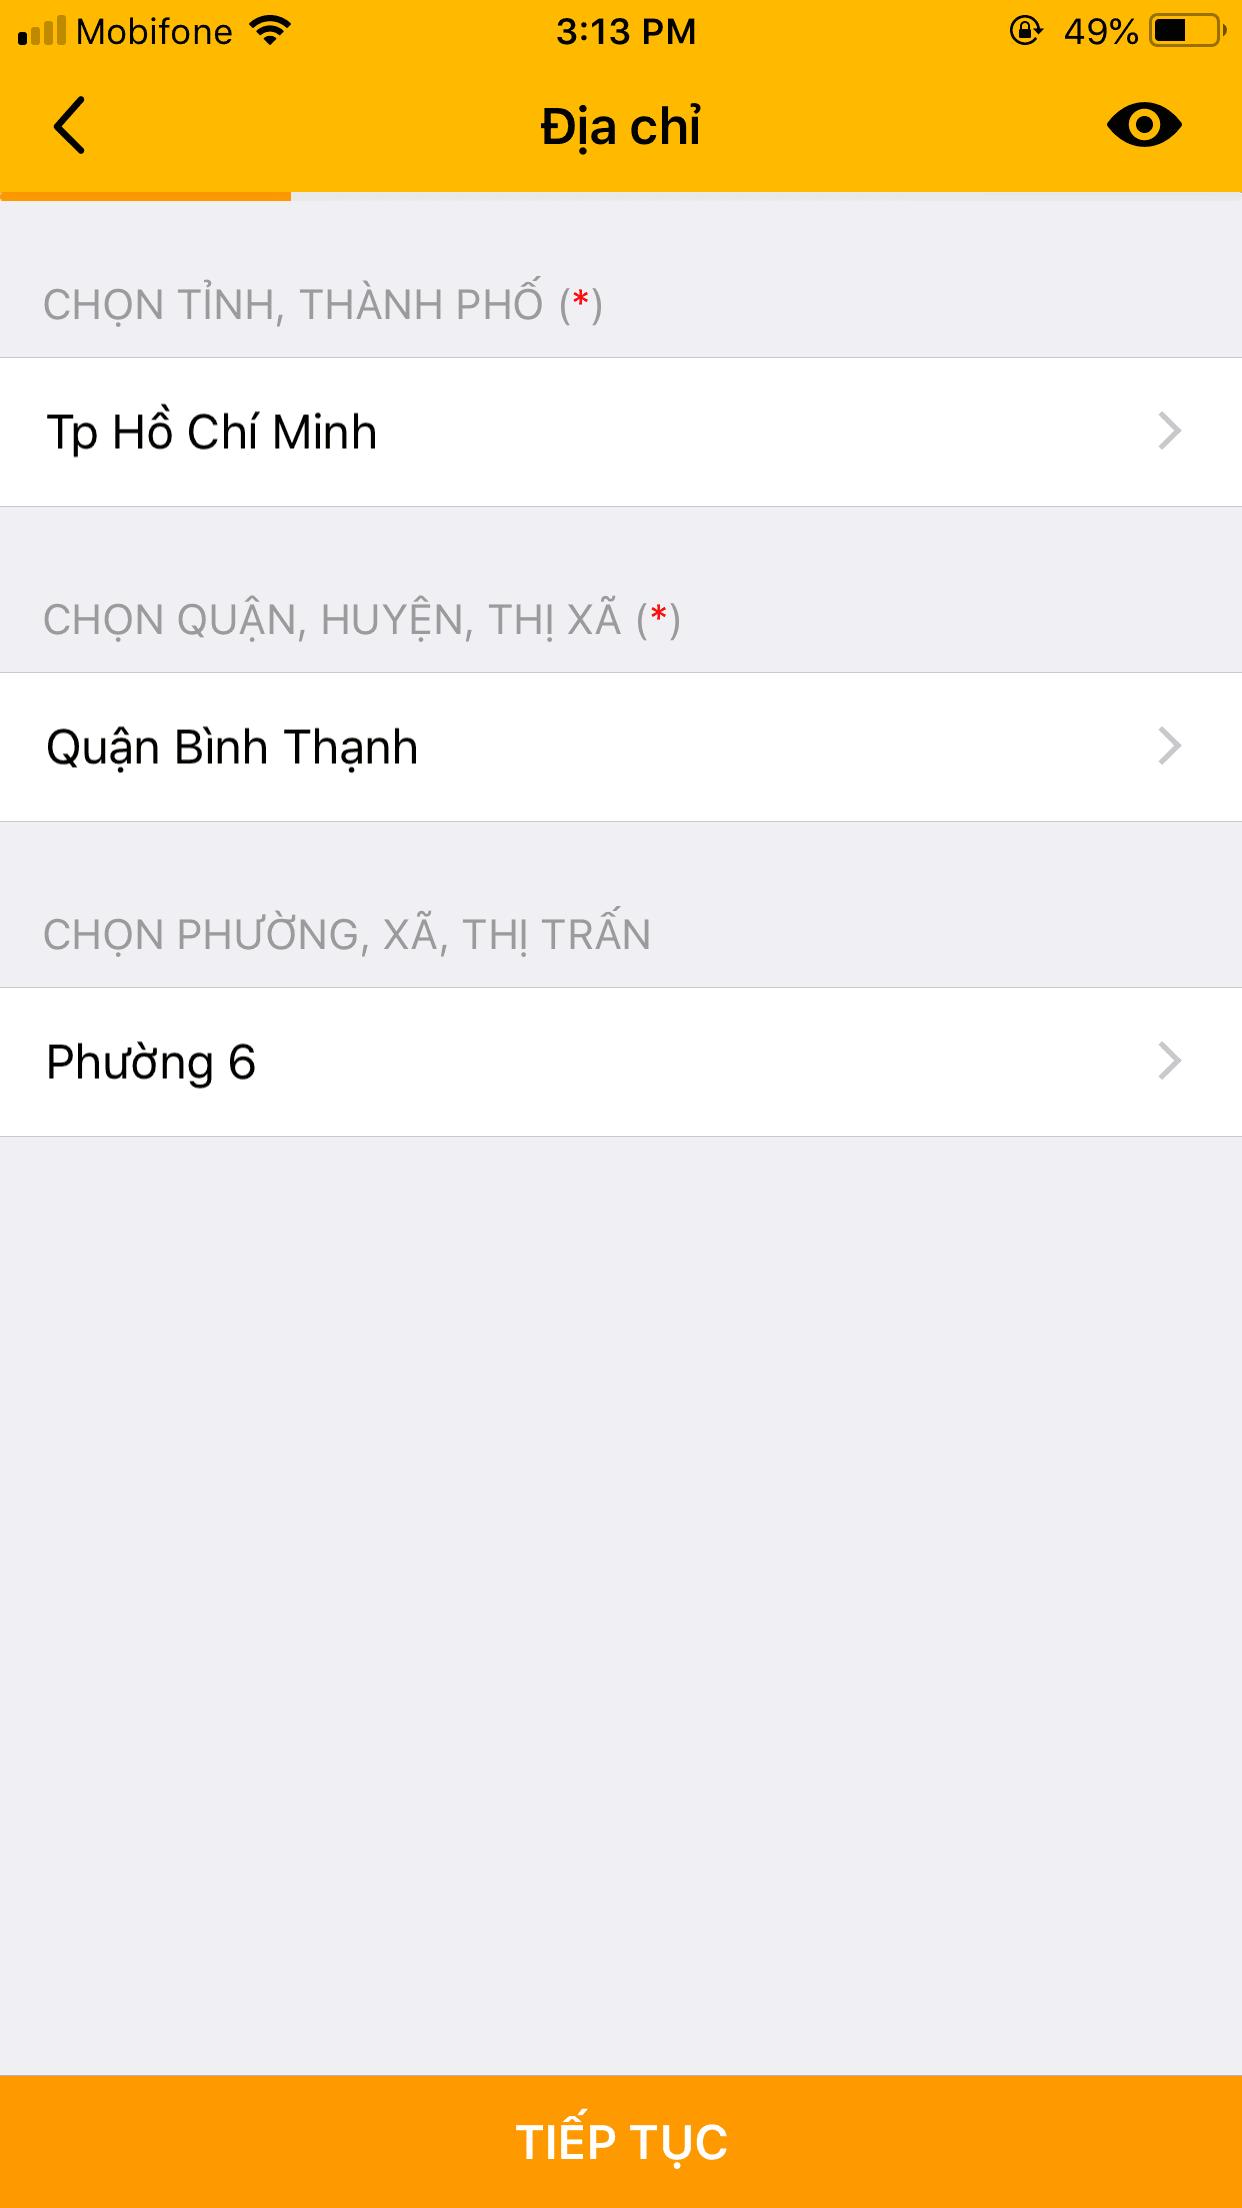 ban-hang-chotot-9